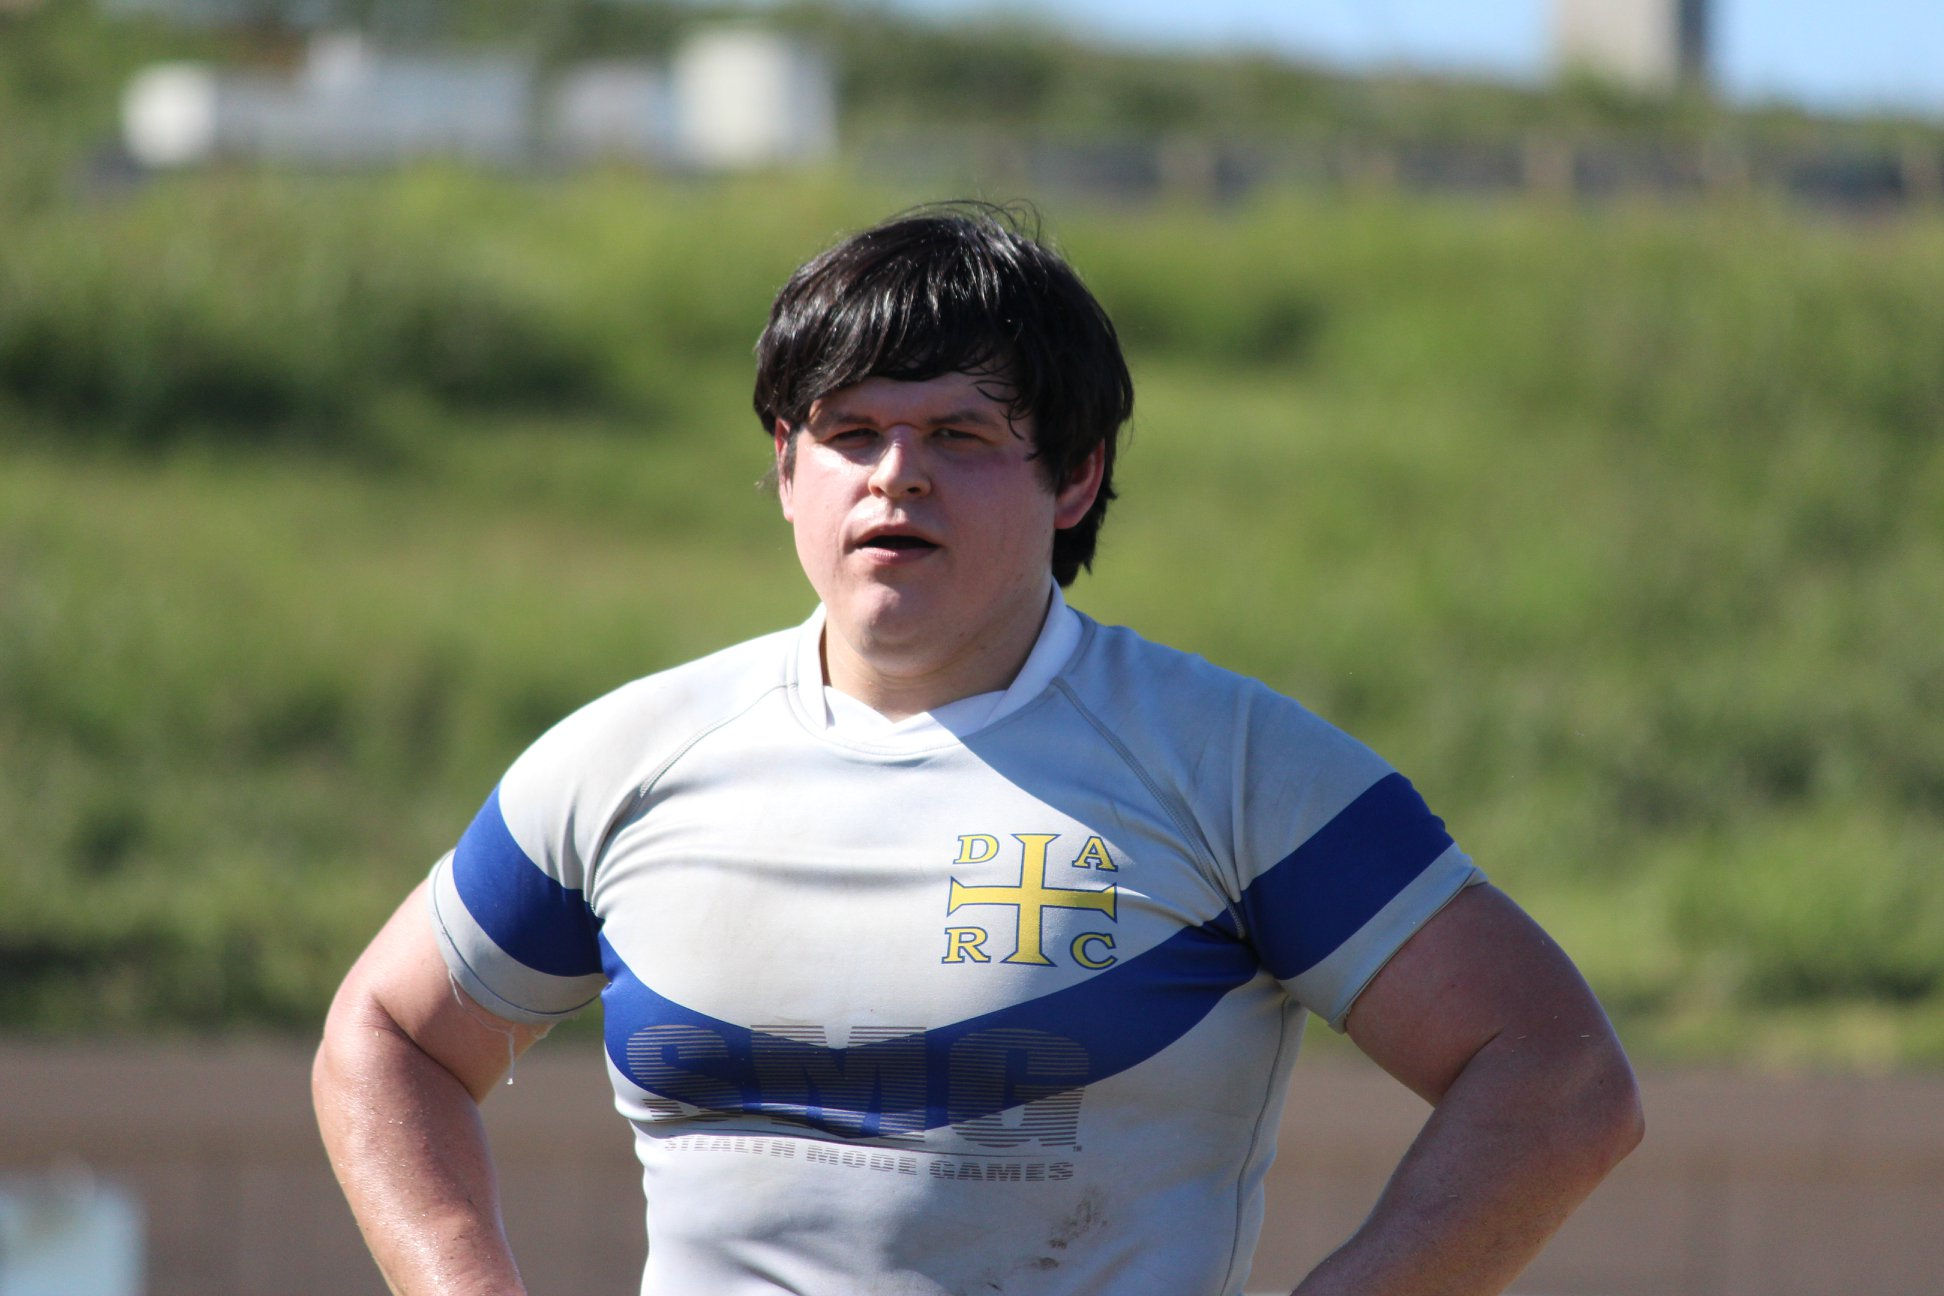 Derrick Rios